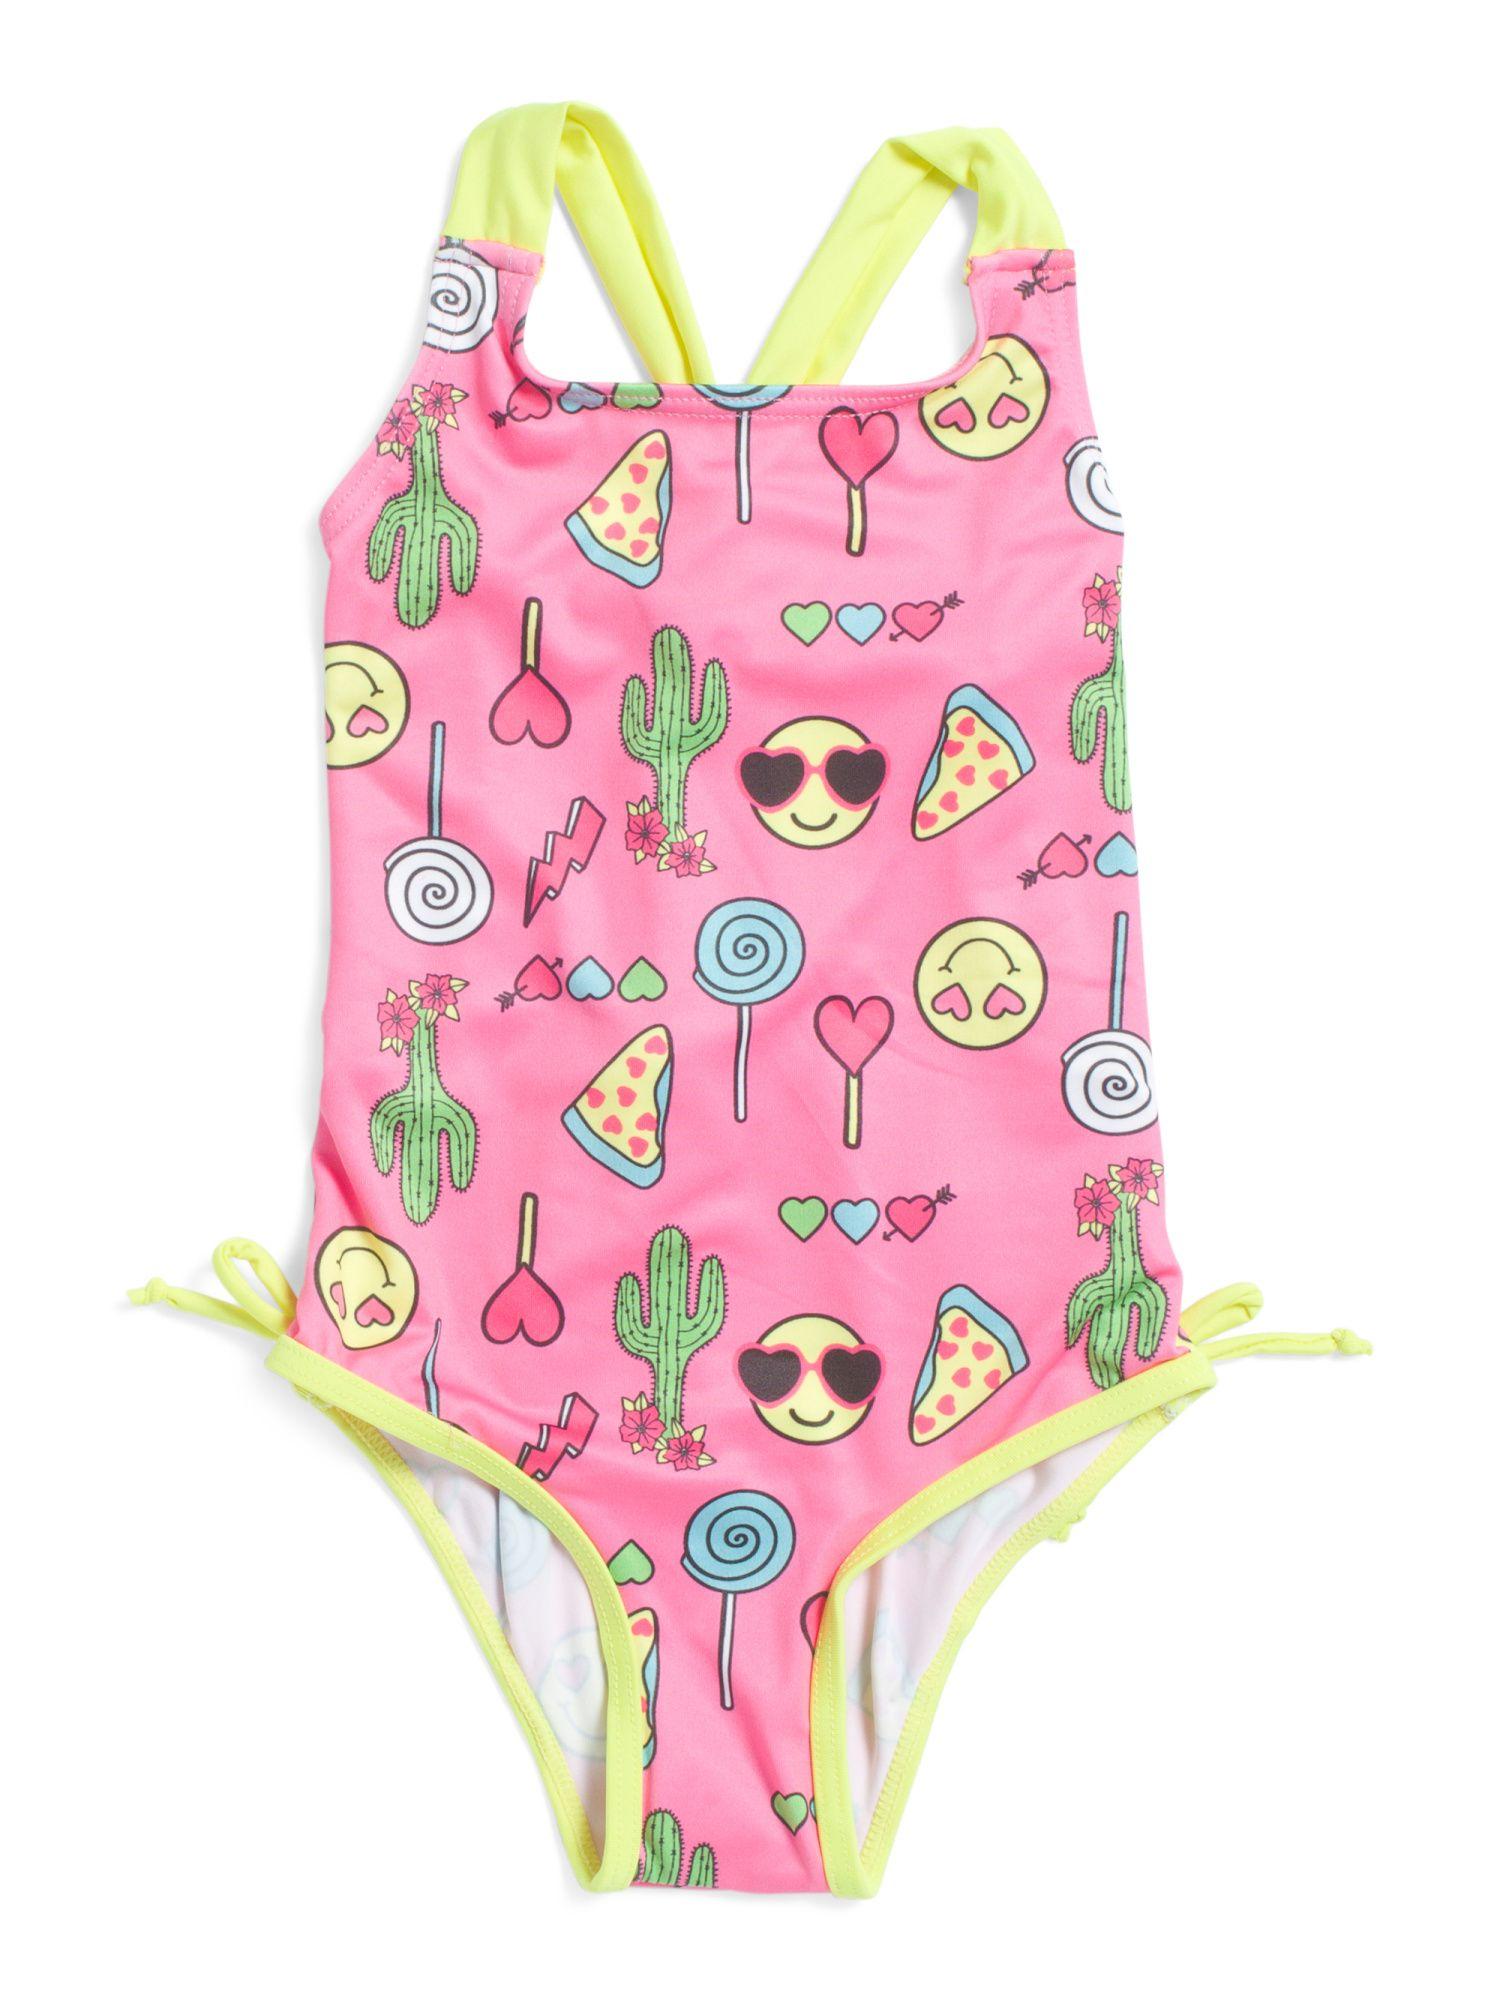 2728c71e86fb7 high resolution image Girl Emoji, Girls 4, Little Girls, Polyester Spandex,  Toddler